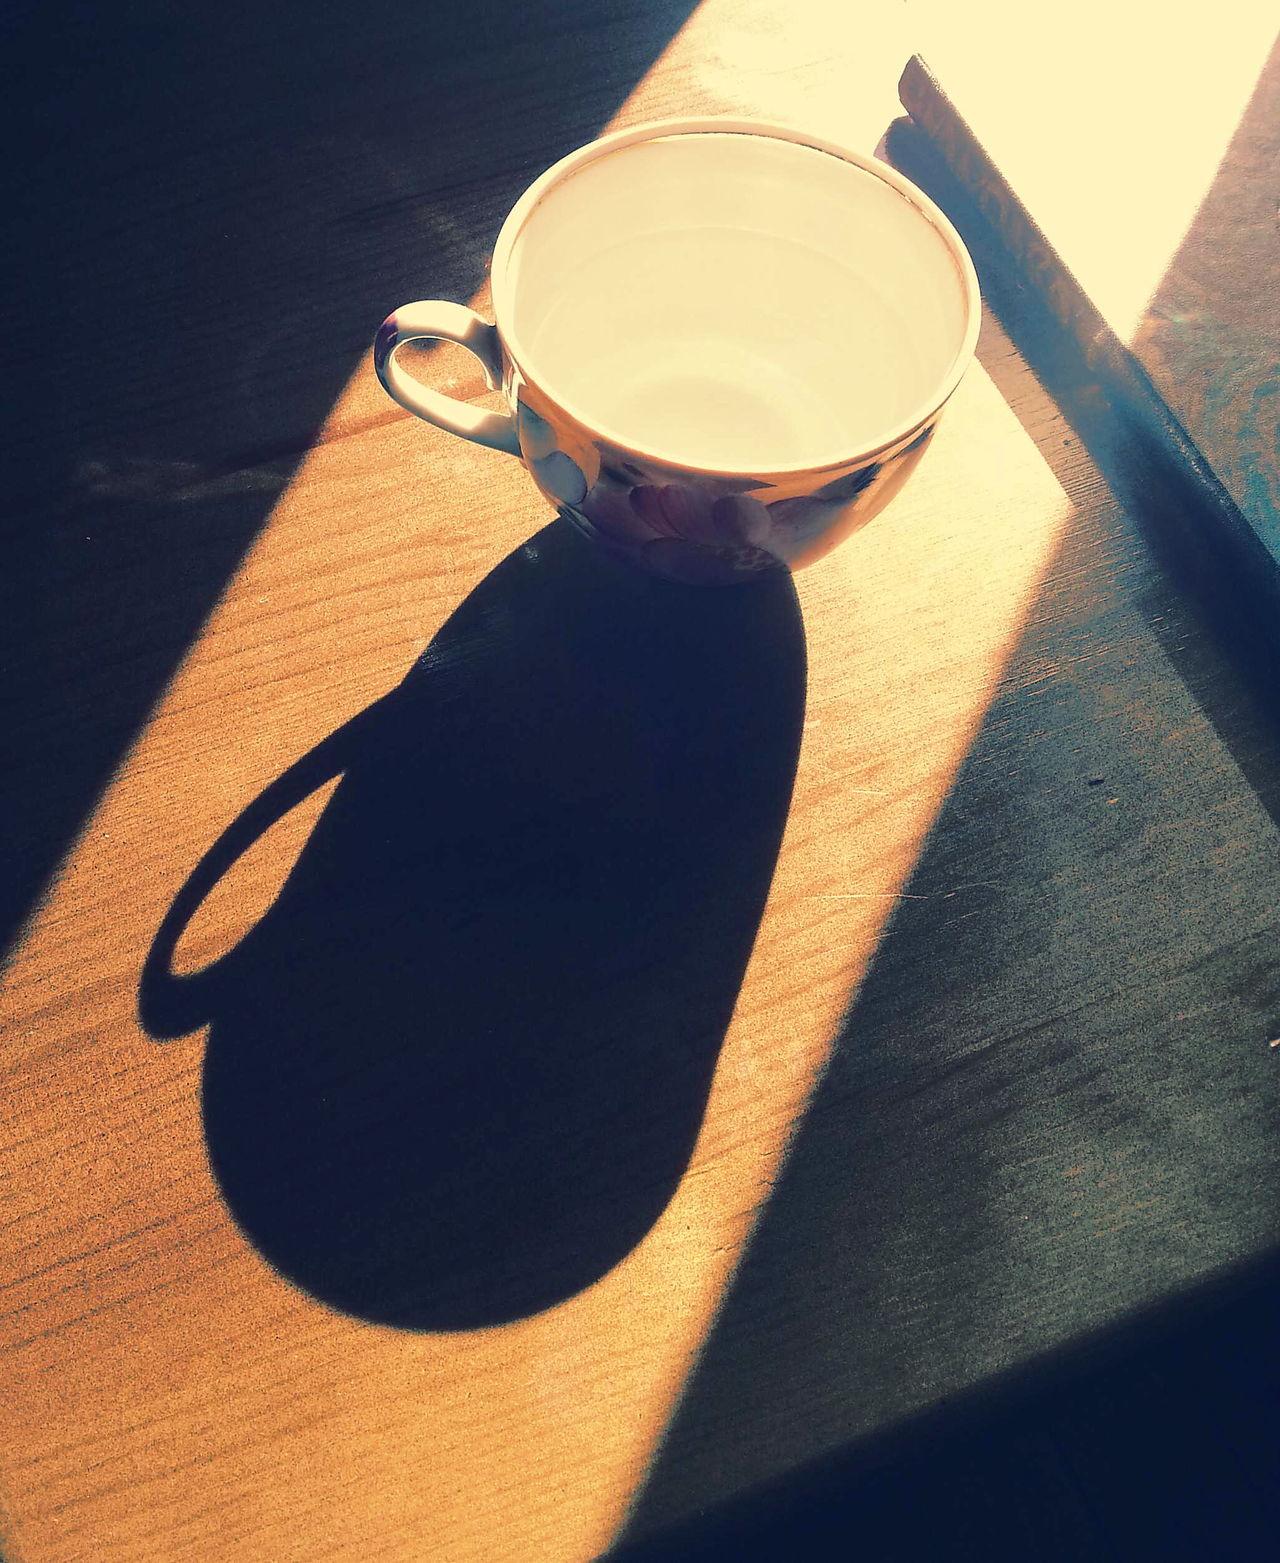 Warm light, blue shadows. .. China Cups Cup Shadows Still Life